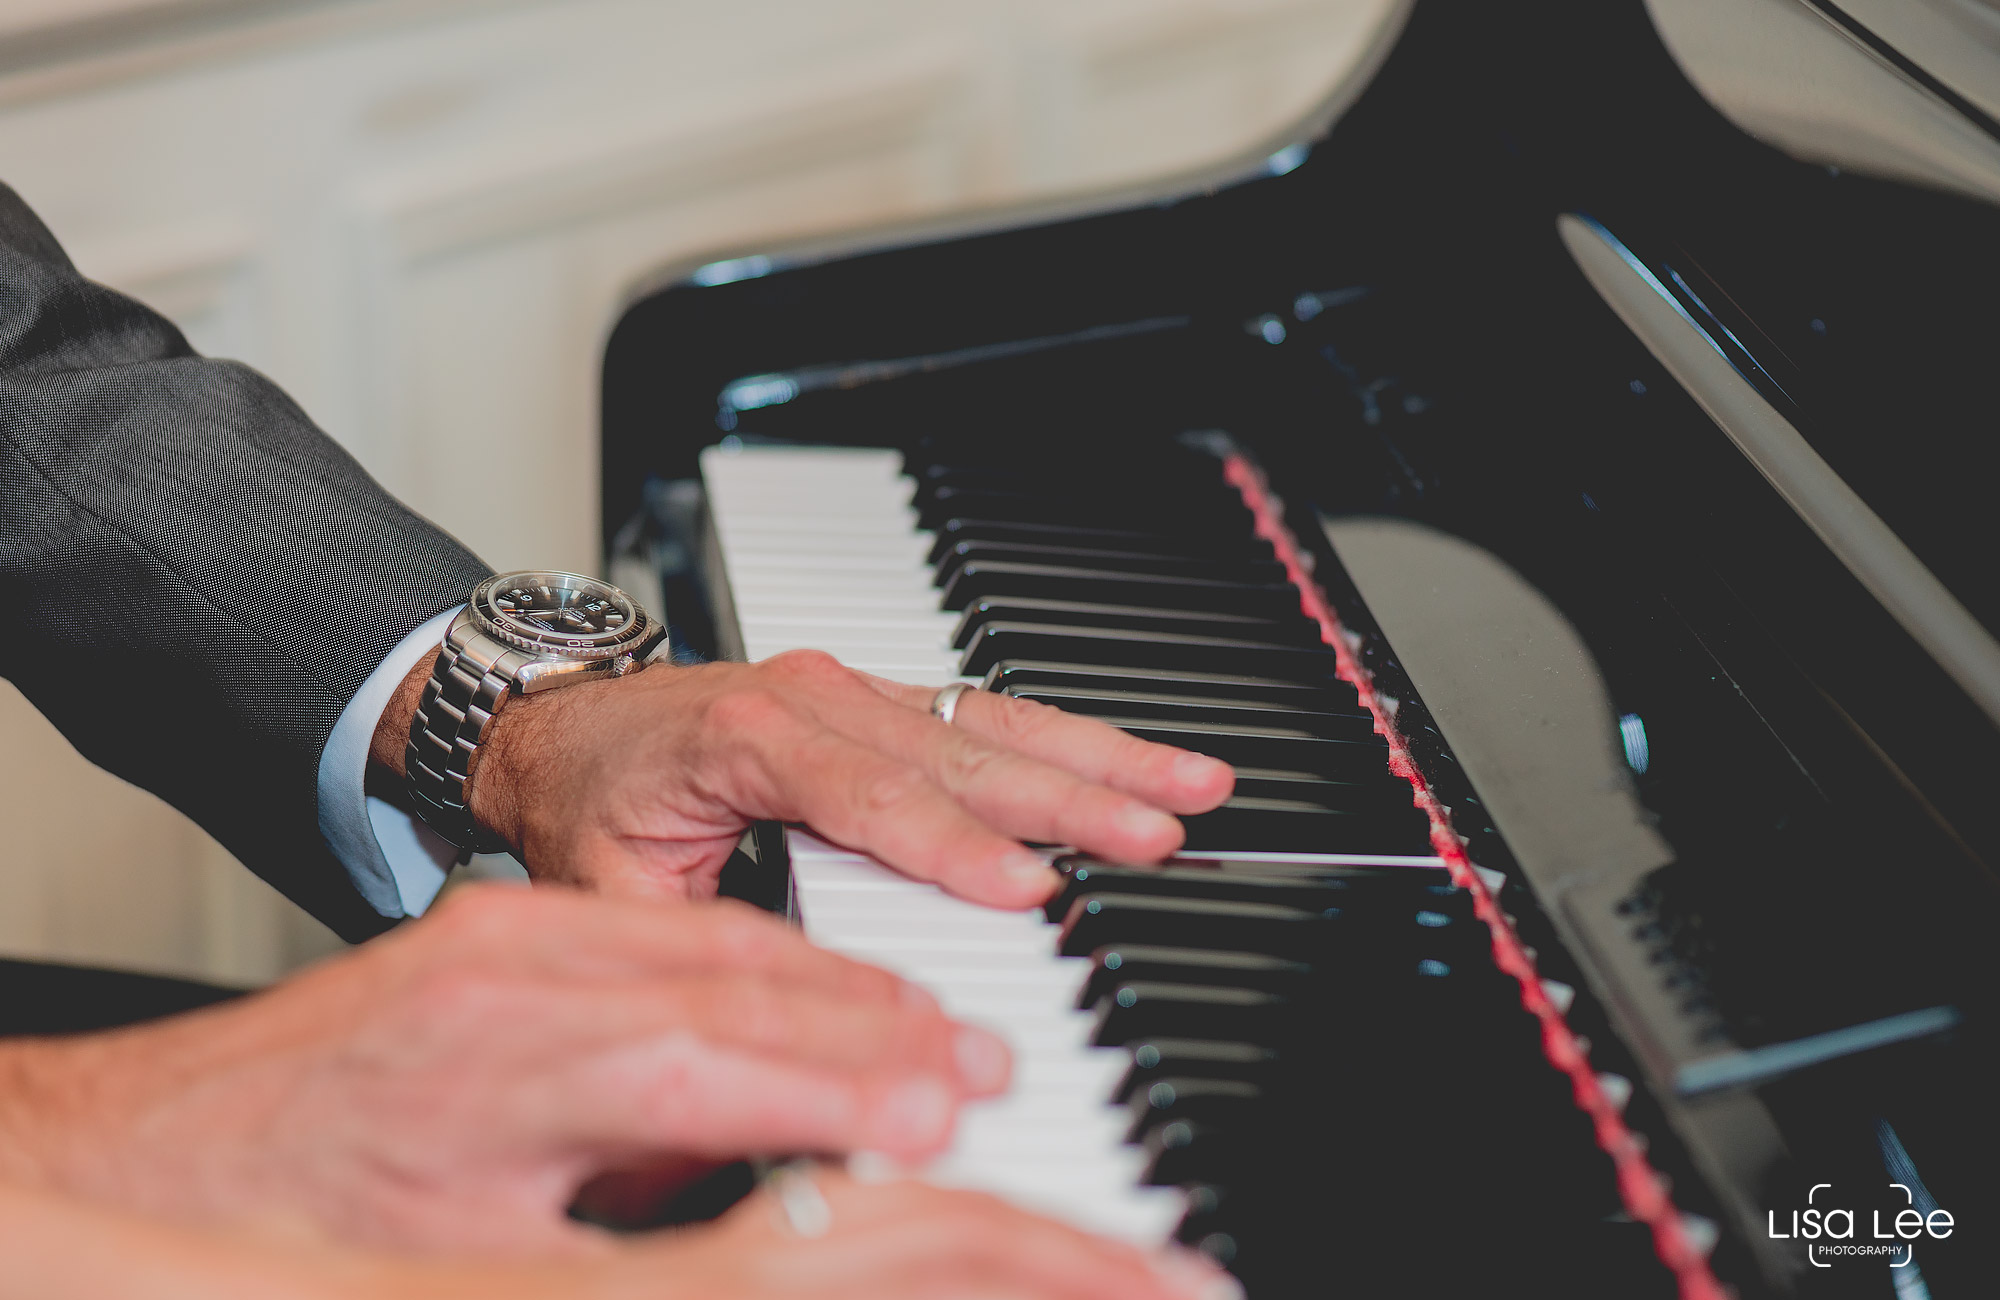 lisa-lee-wedding-photography-christchurch-dorset-pianohands.jpg